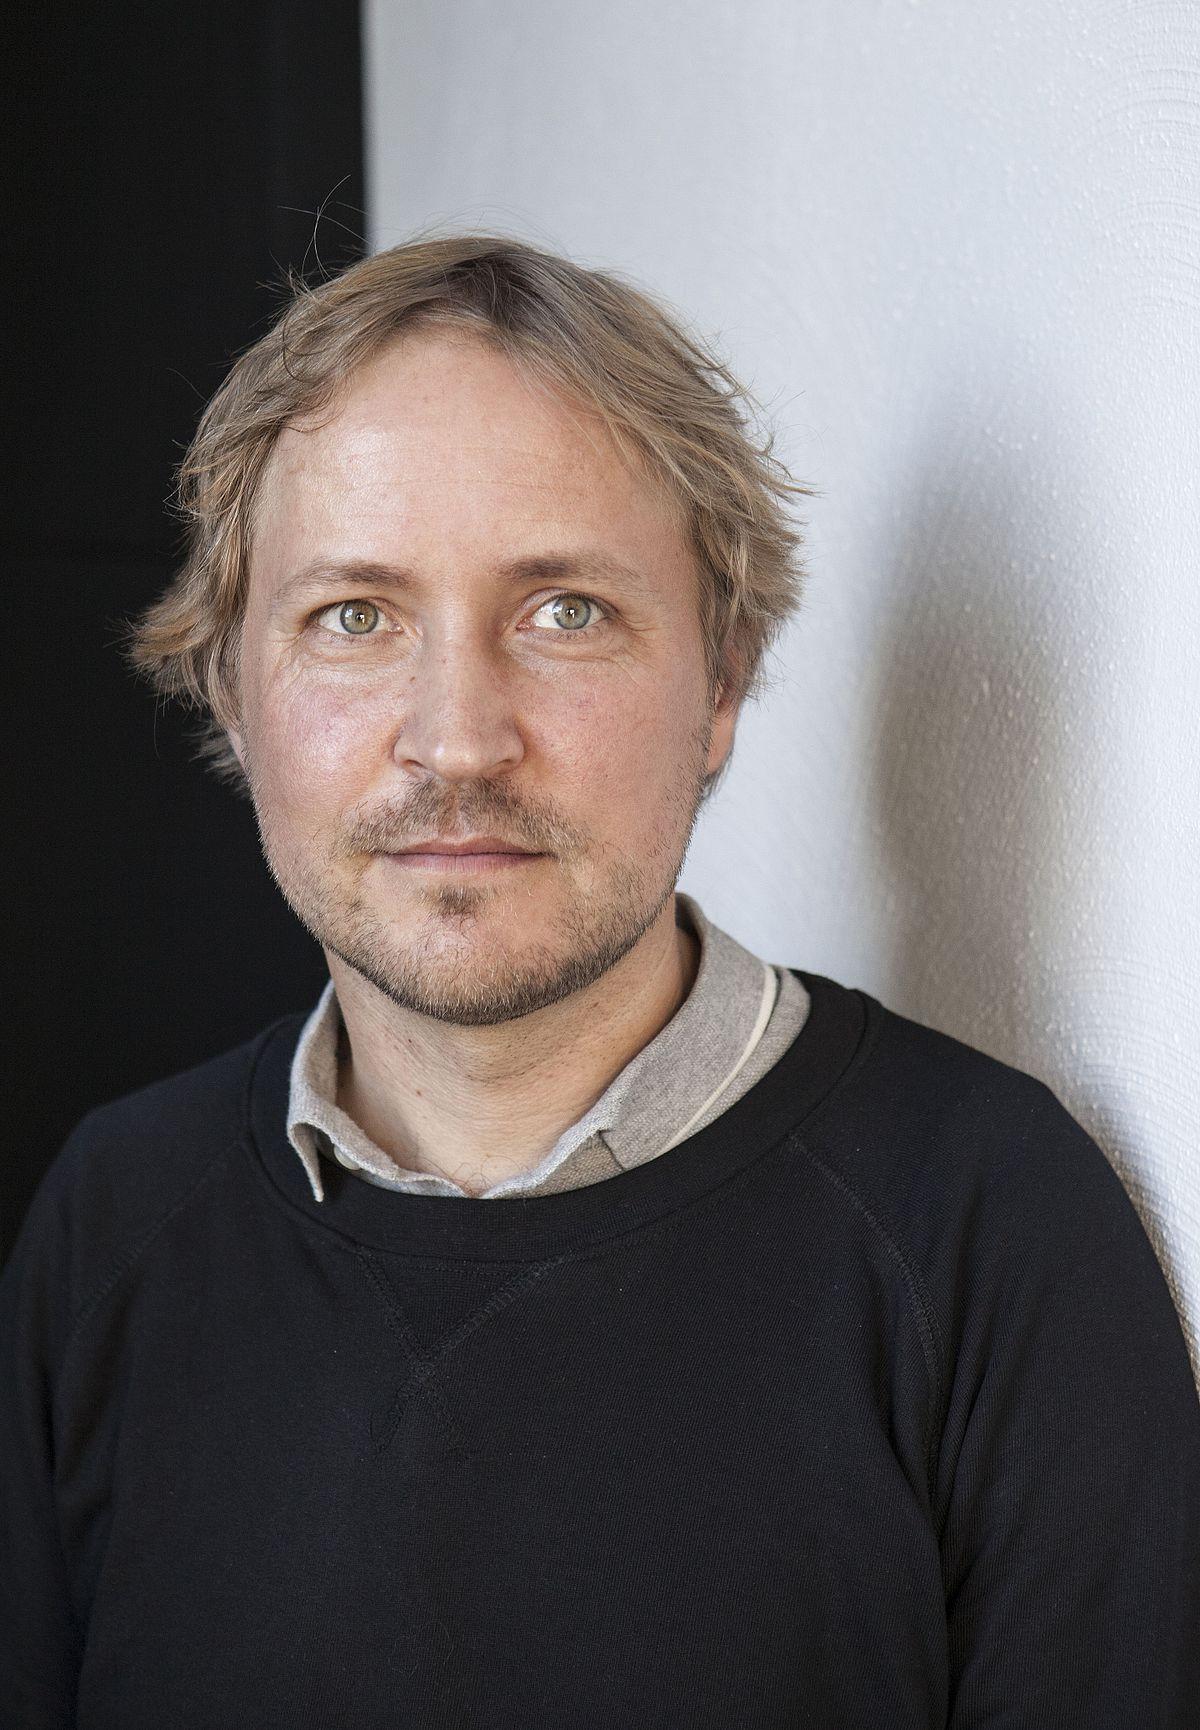 Jari Silomäki